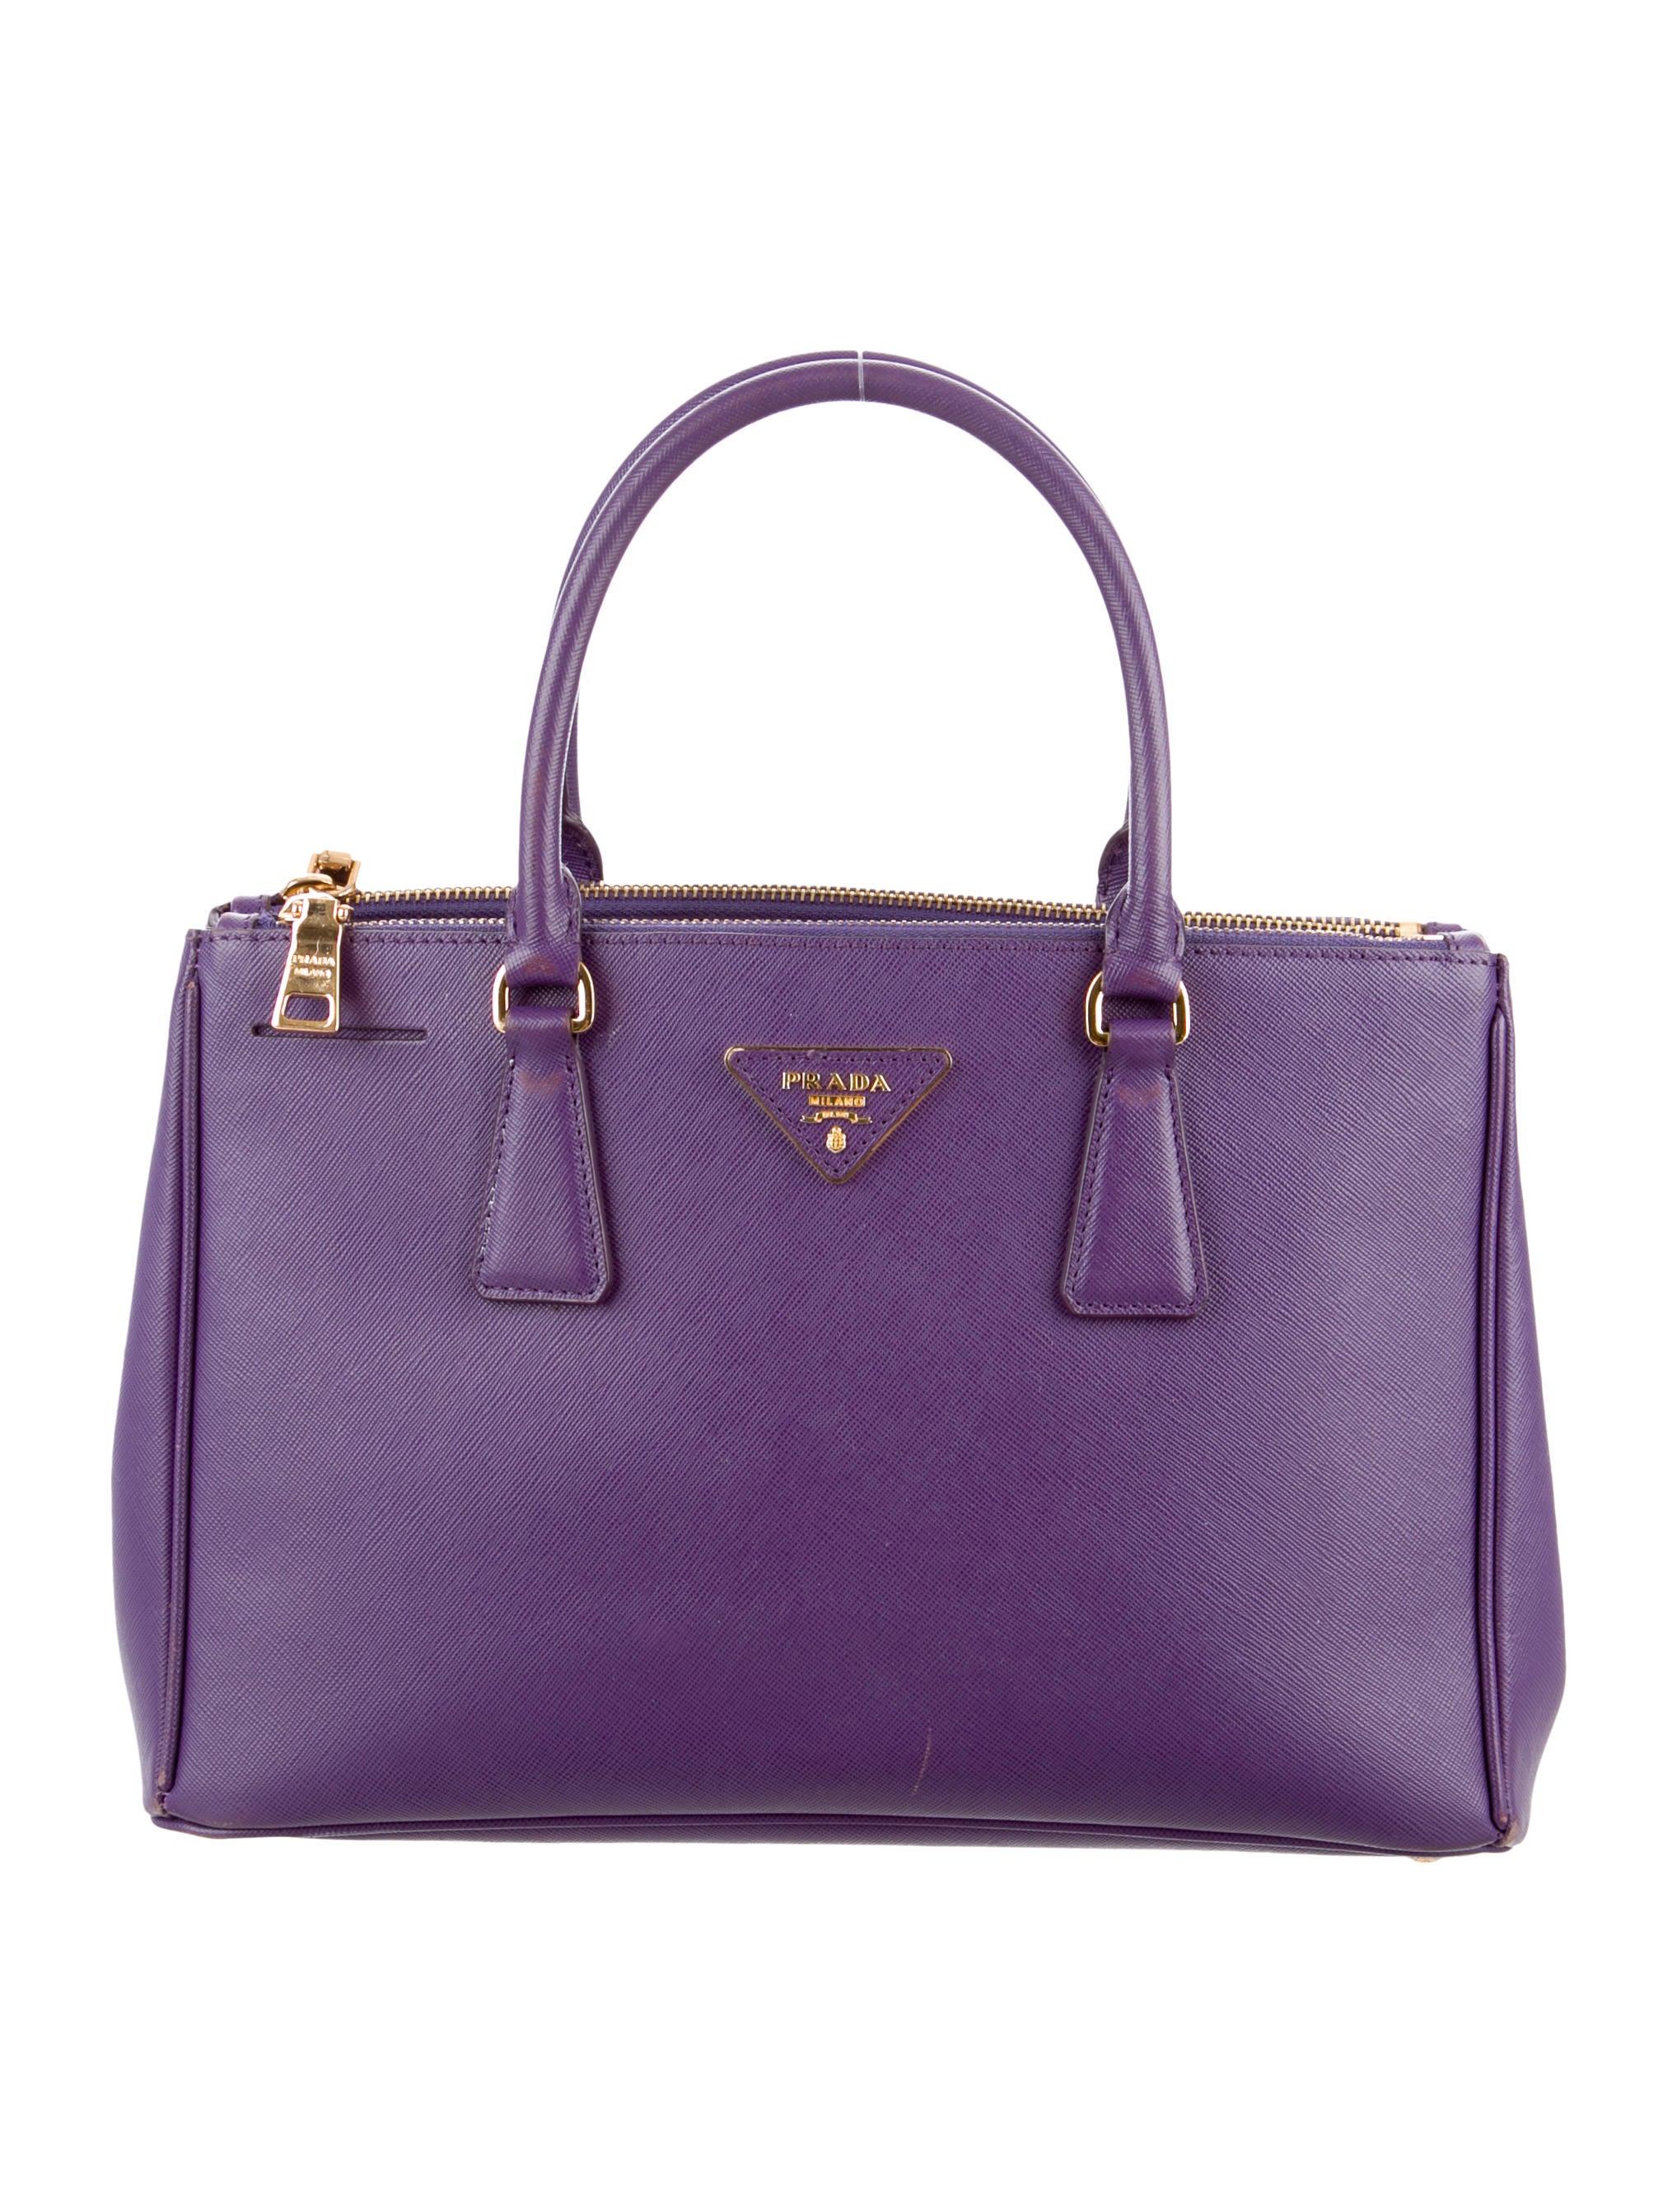 886fd39c5 Prada Saffiano Lux Small Double Zip Tote - Handbags - PRA82726 | The  RealReal